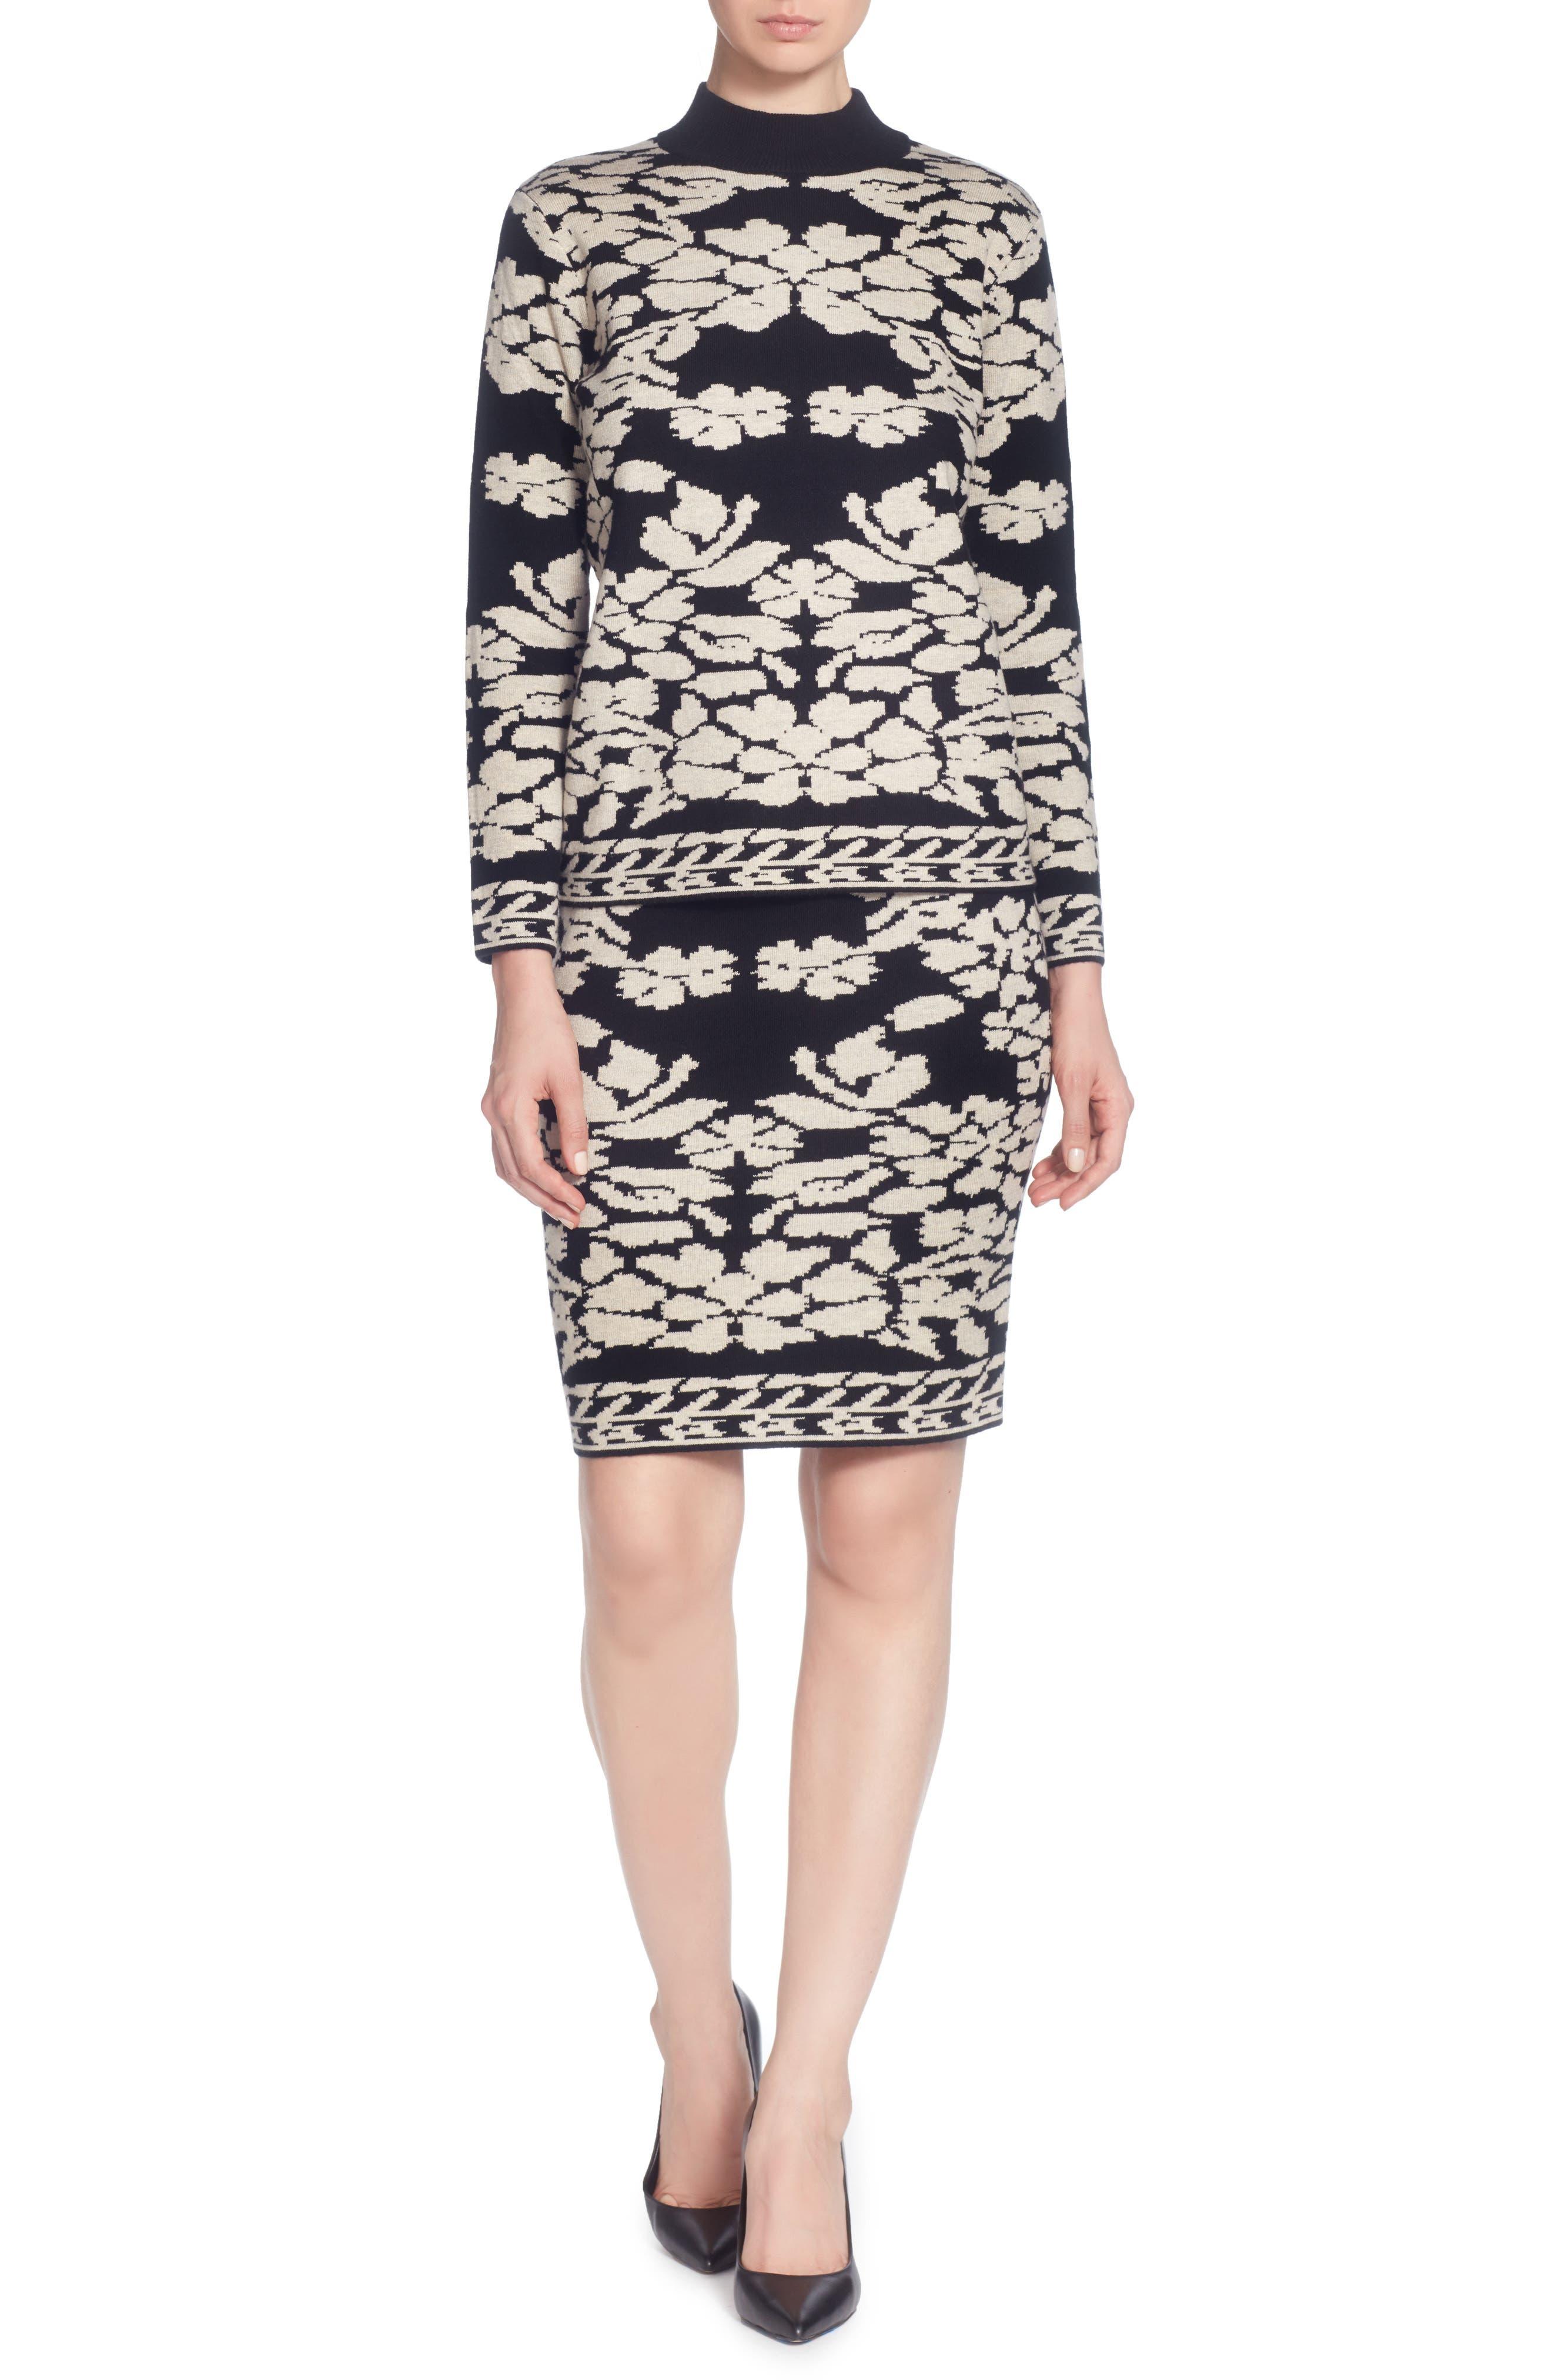 Uffie Floral Knit Skirt,                             Main thumbnail 1, color,                             Black/ Neutral